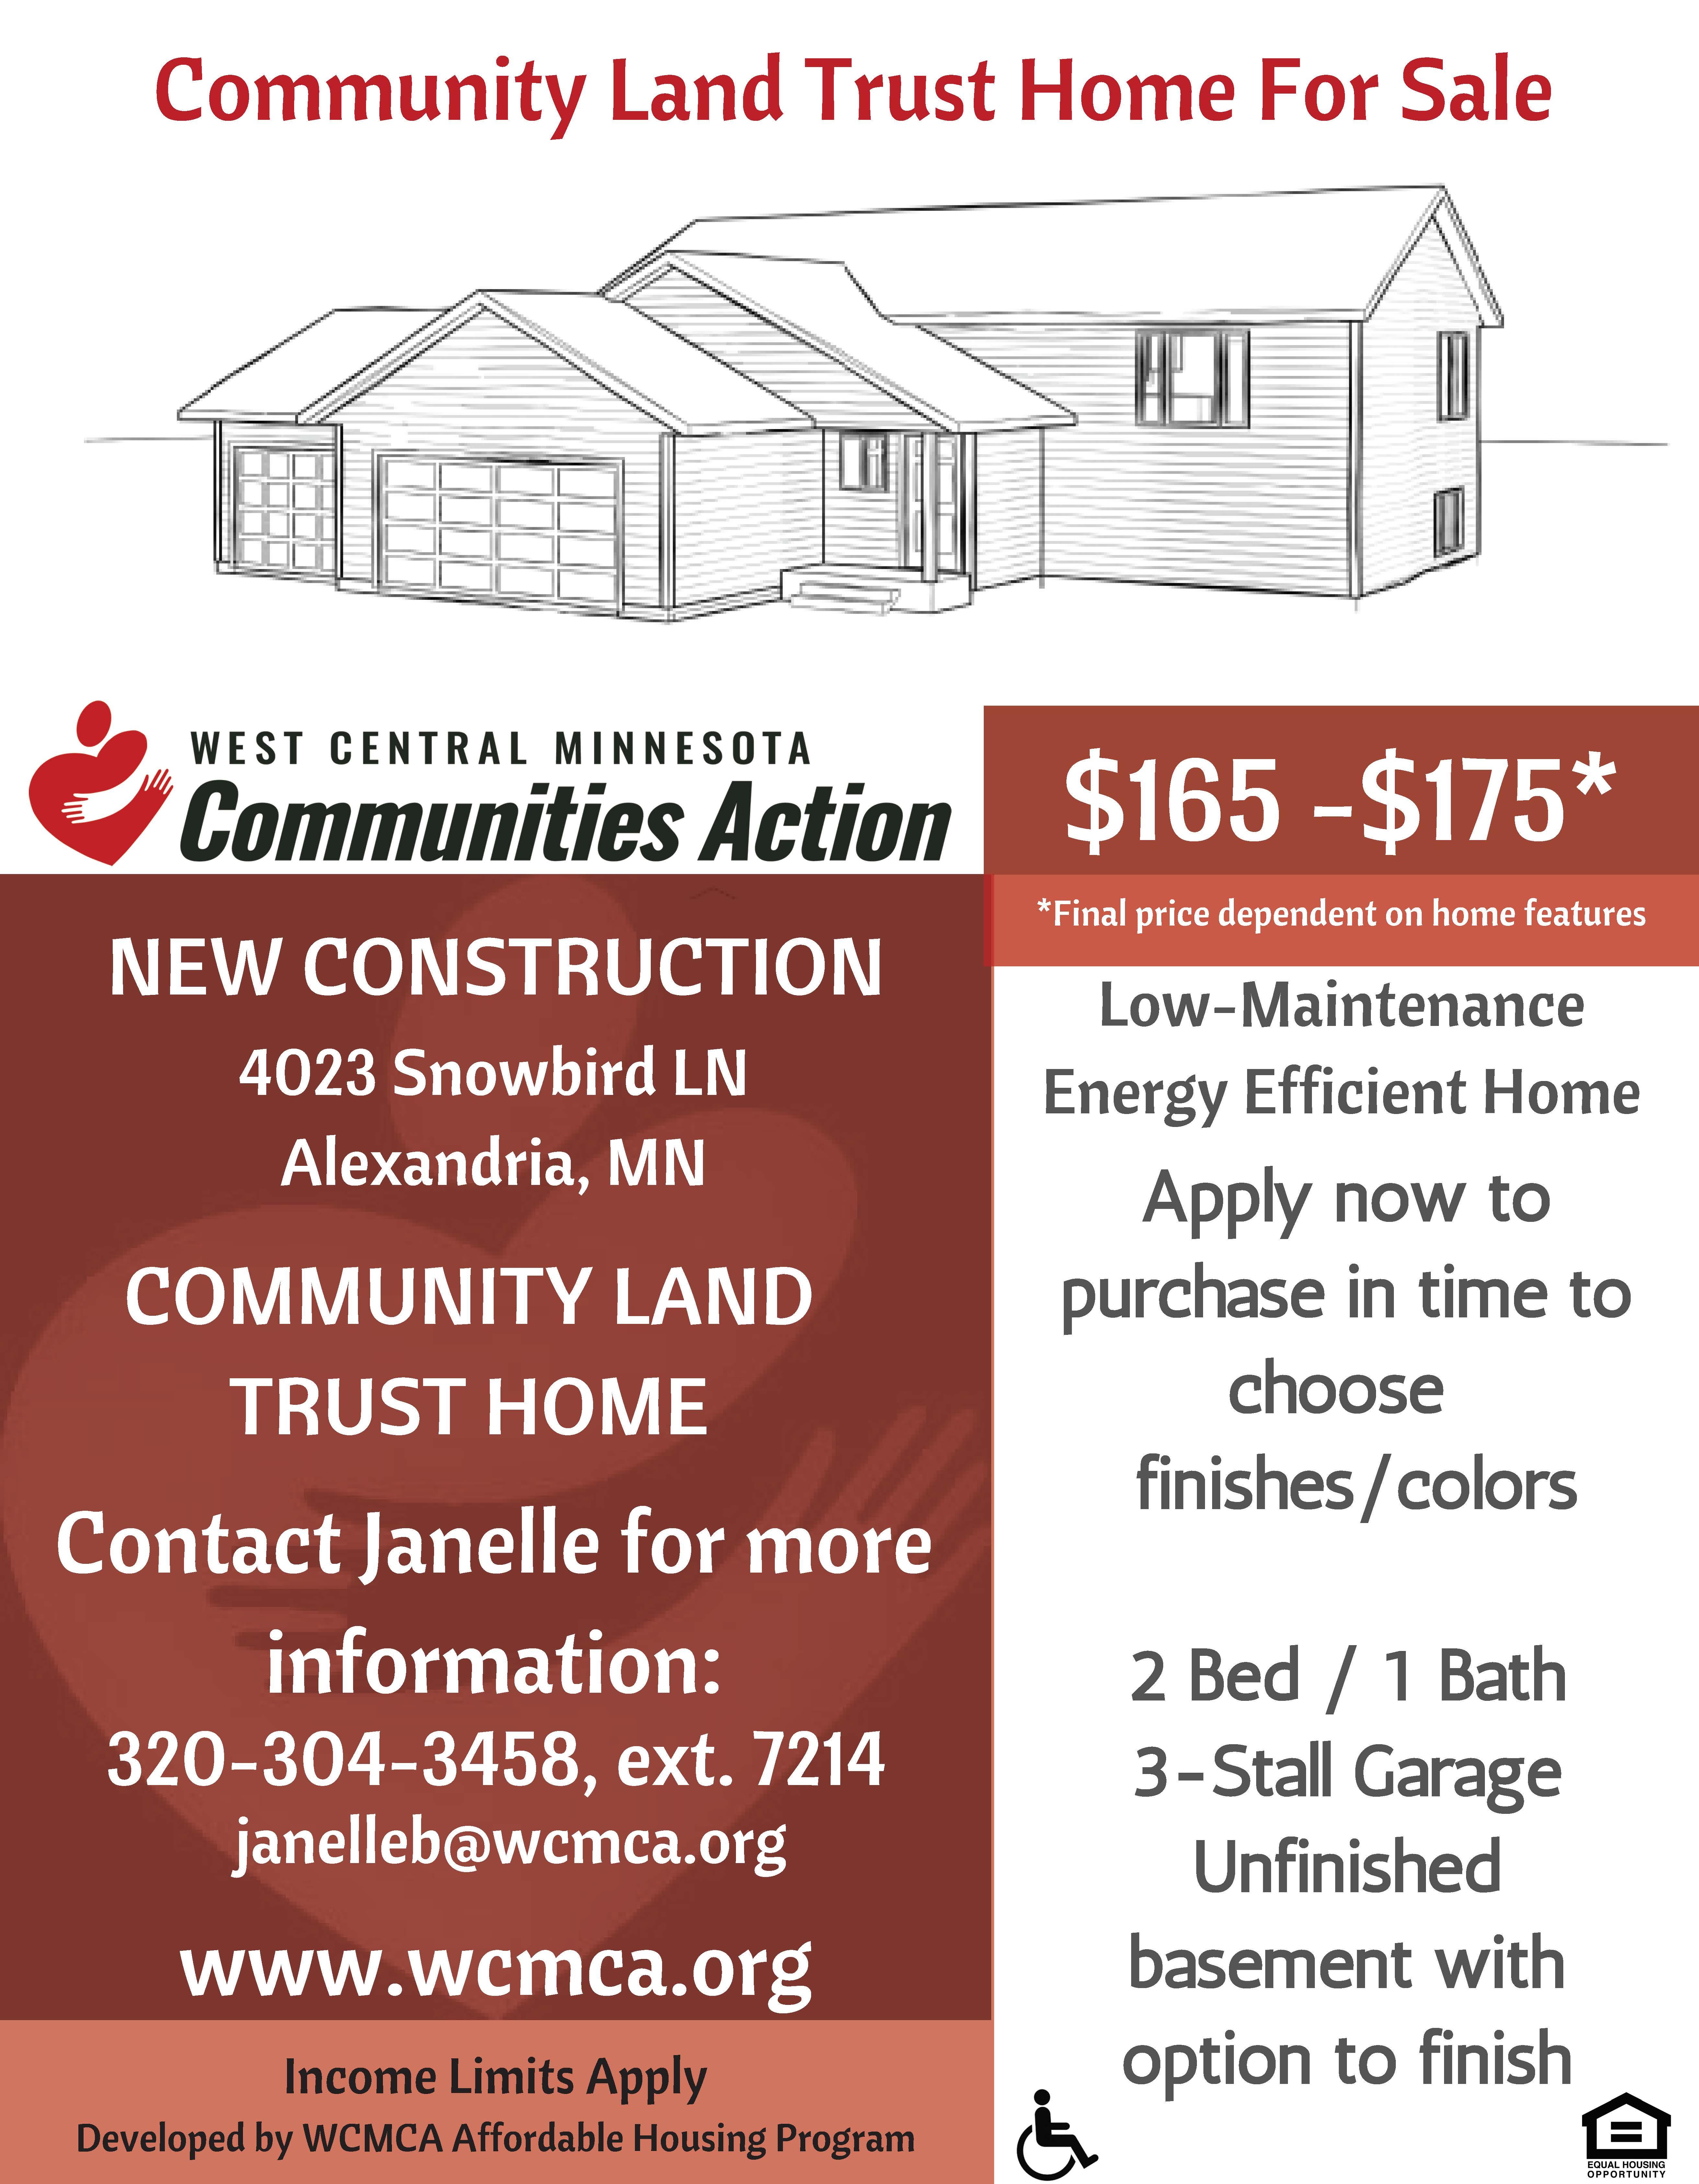 Community Land Trust, 4023 Snowbird Lane, Alexandria